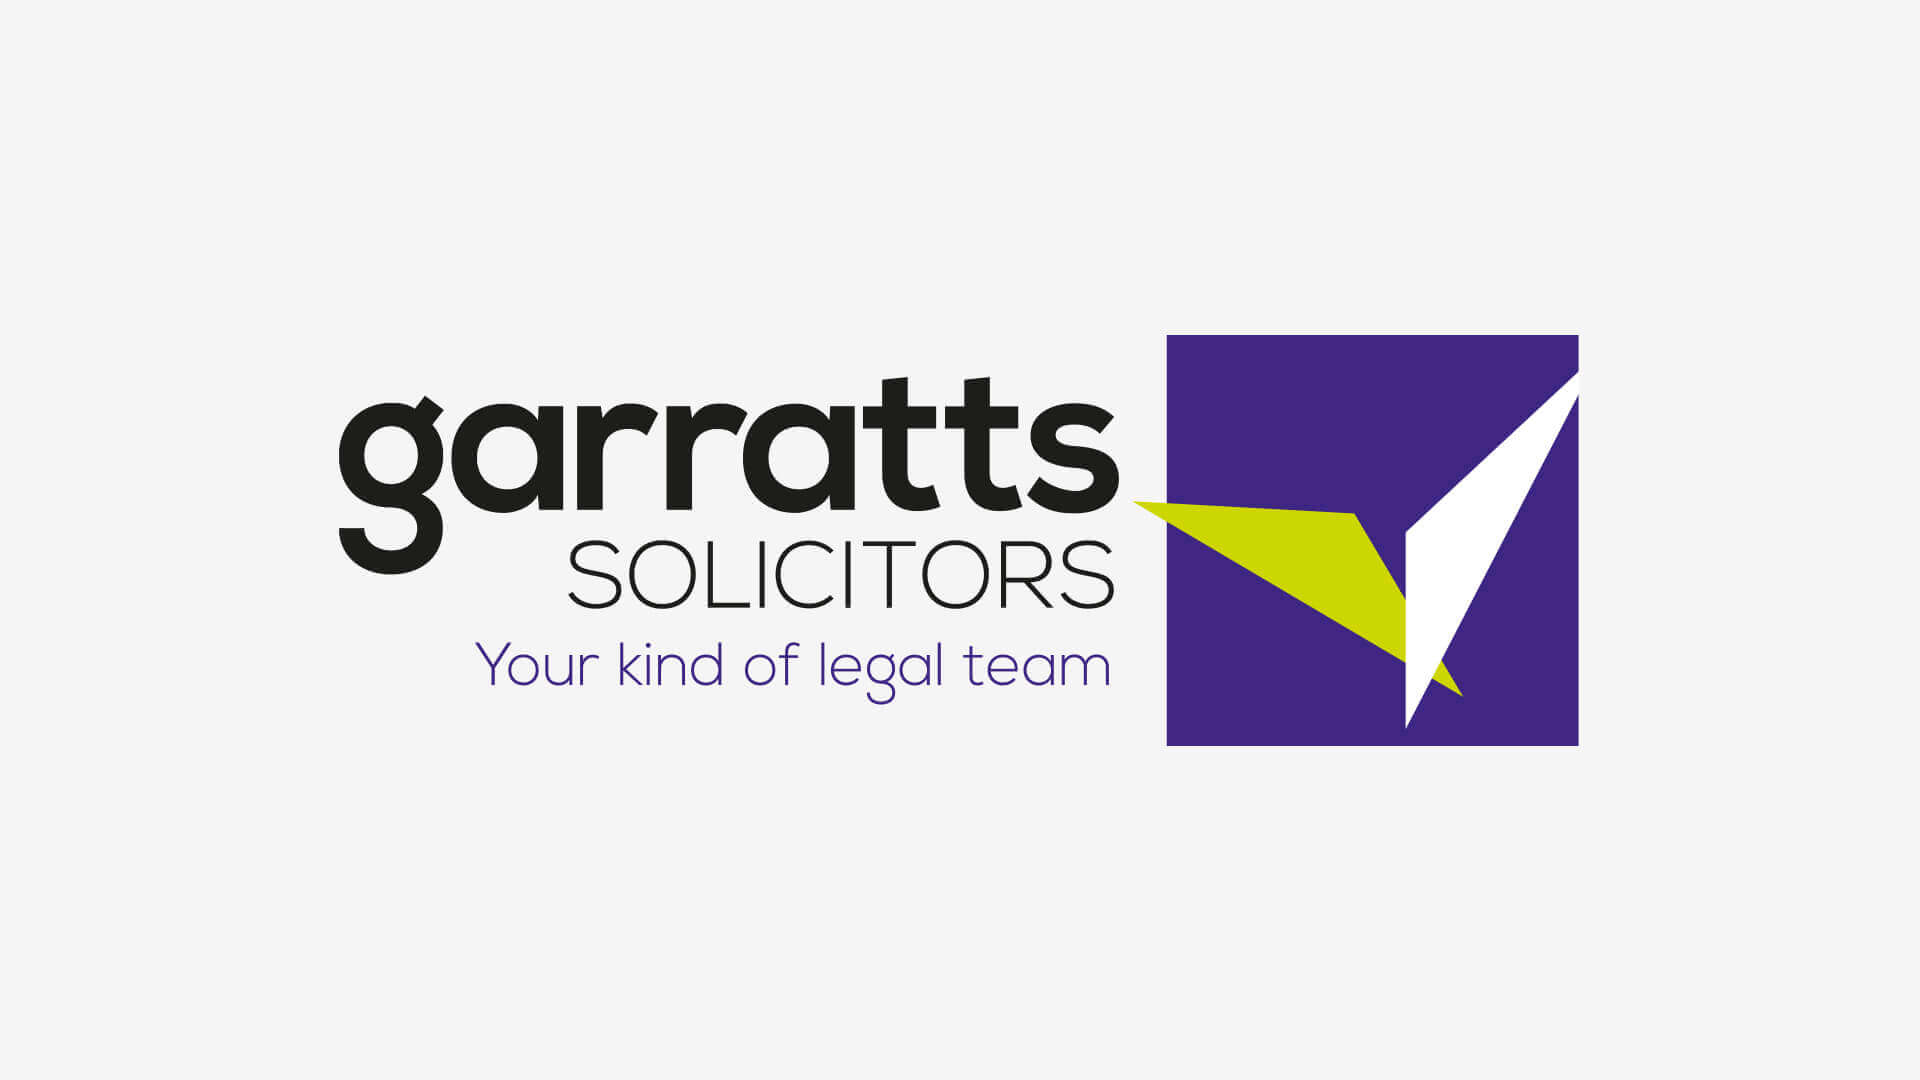 Garratts Solicitors image